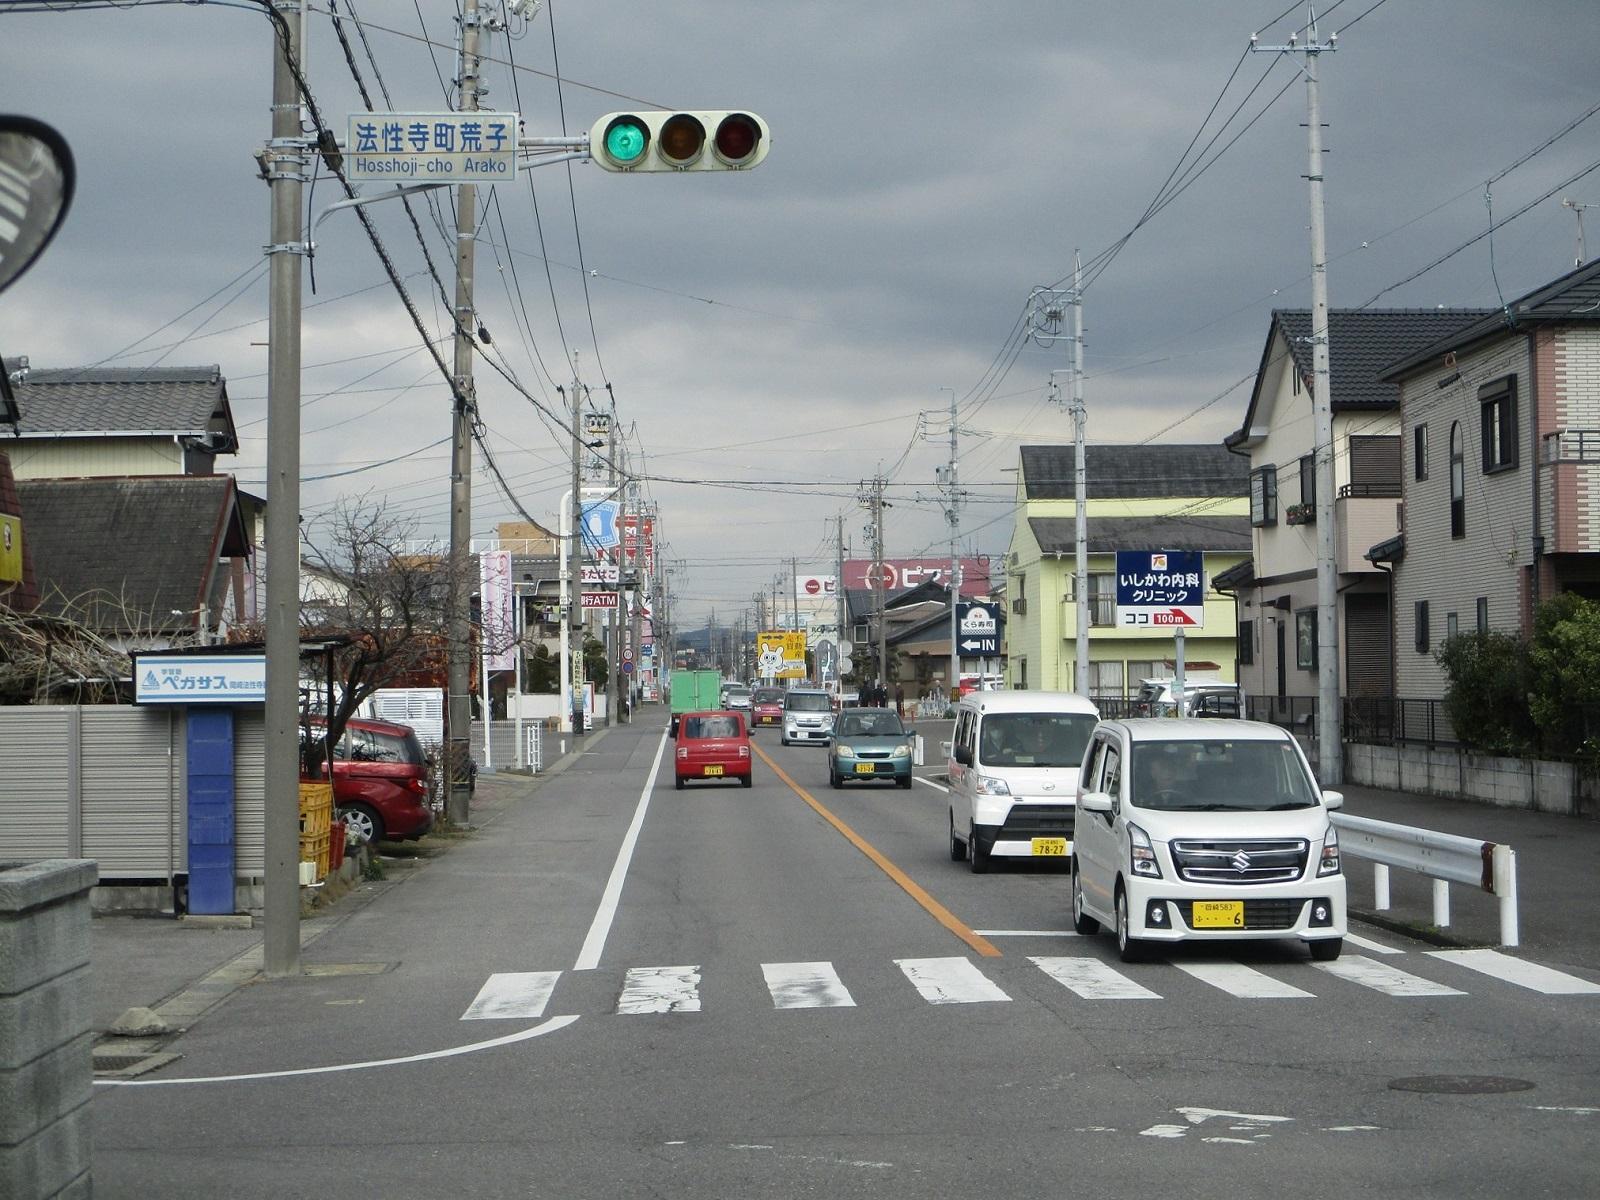 2020.2.26 (46) JR岡崎駅西口いきバス - 法性寺町荒子交差点を右折 1600-1200